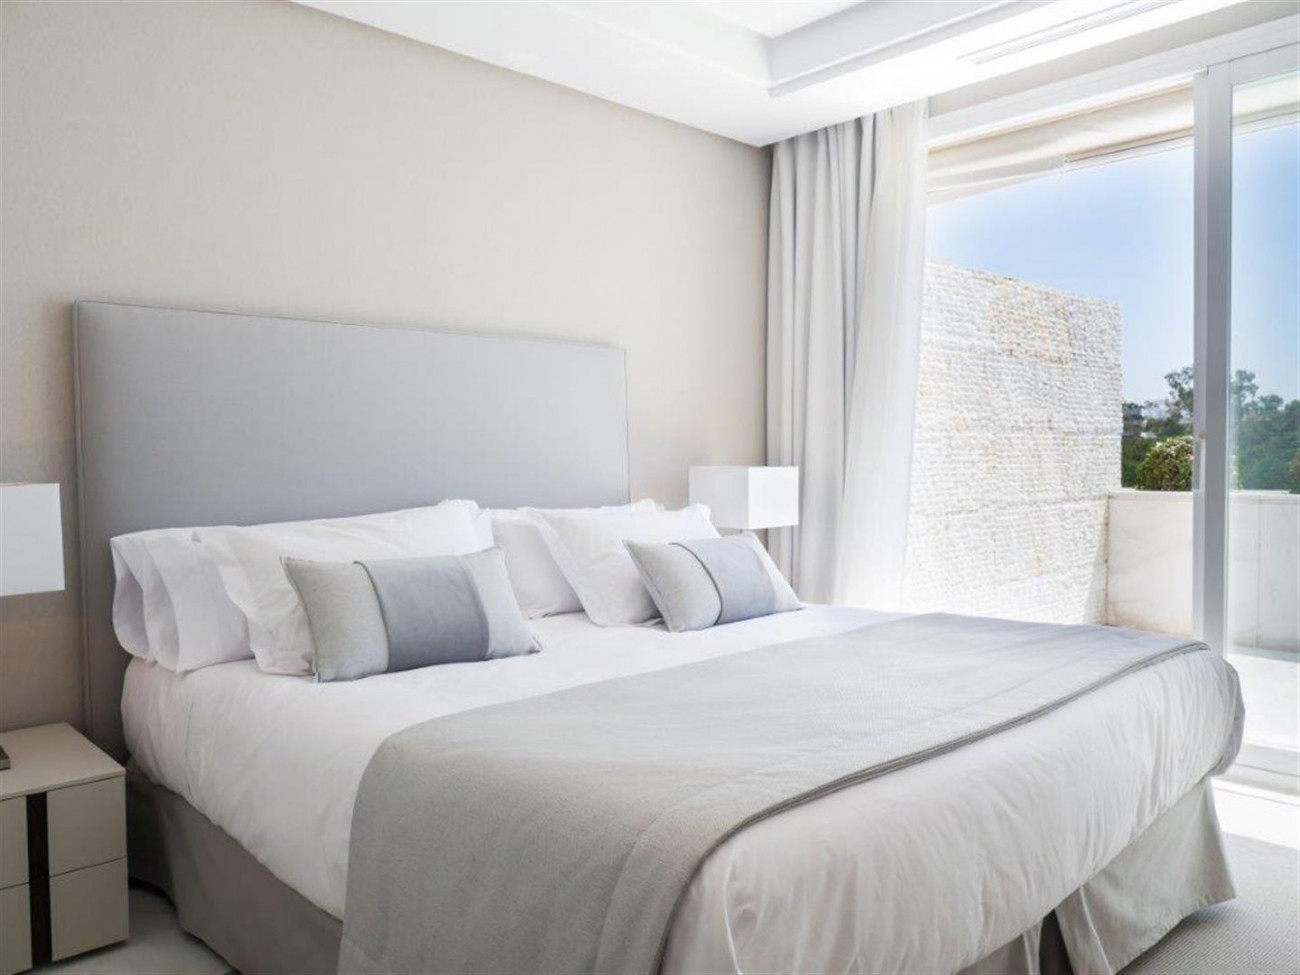 A5579 Frontline beach duplex penthouse Marbella 4 (Large)